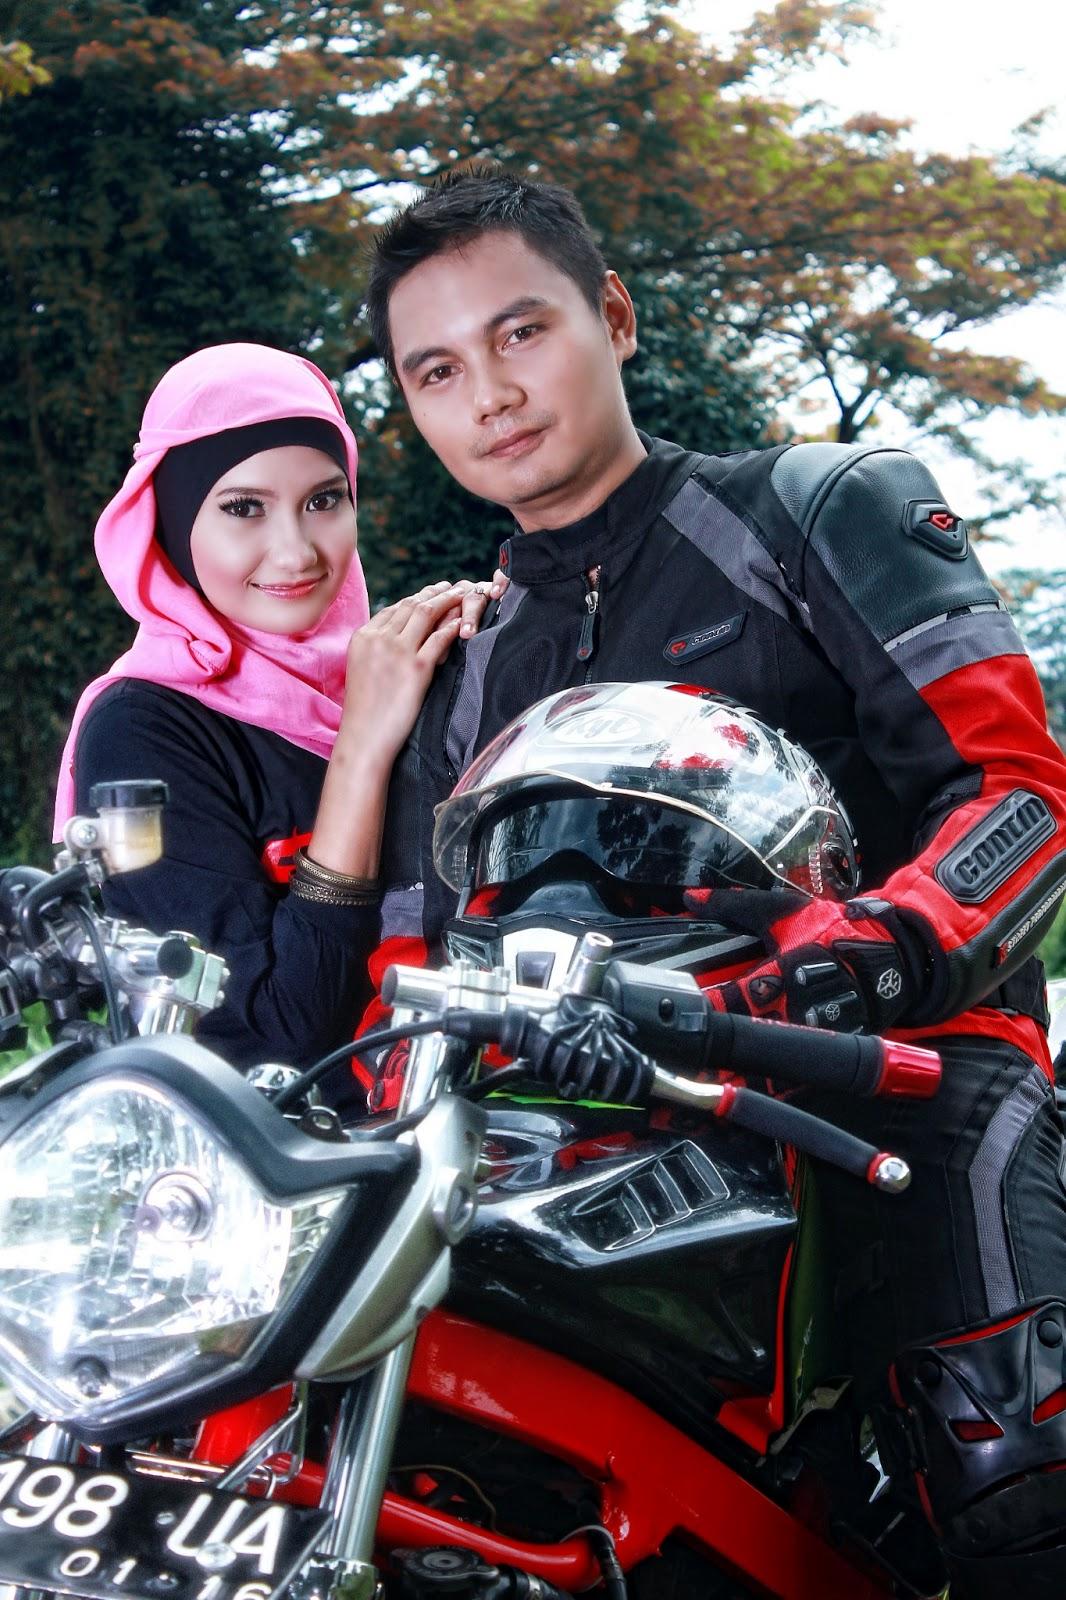 Foto Prewedding Naik Motor Ninja Prewedmoto